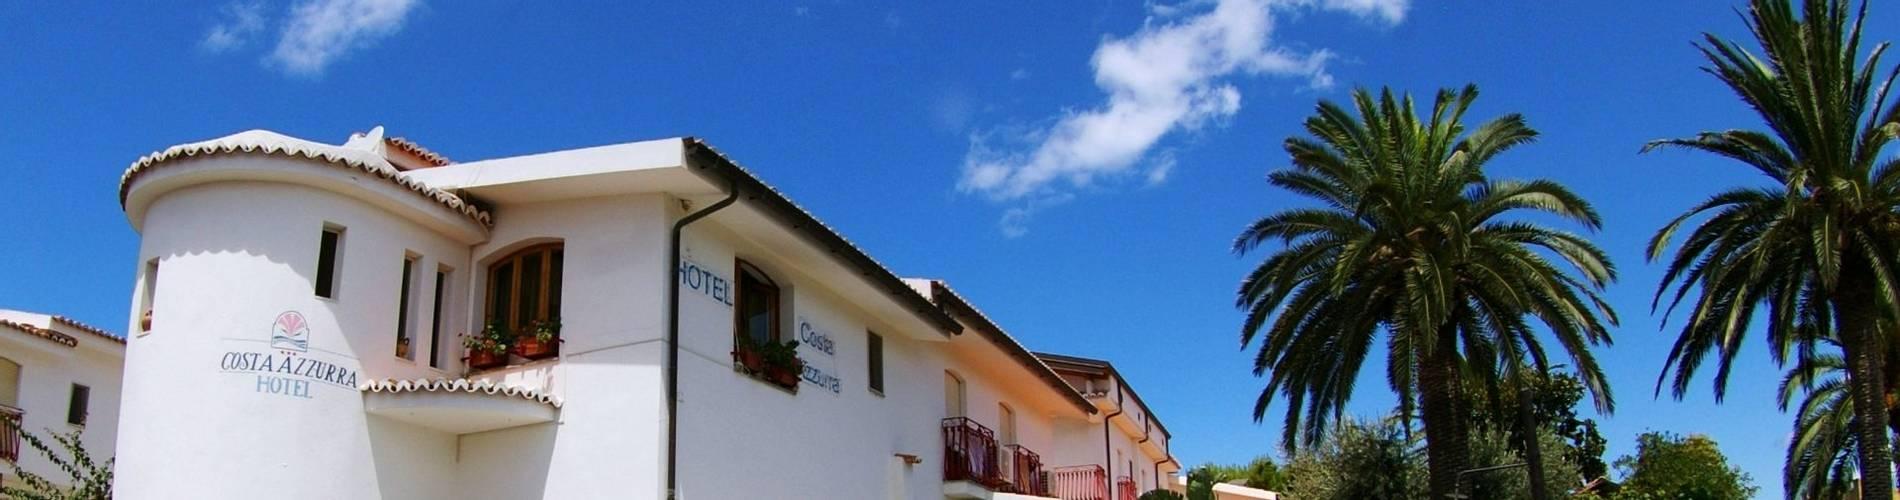 Costa Azzurra, Calabria, Italy (6).jpg